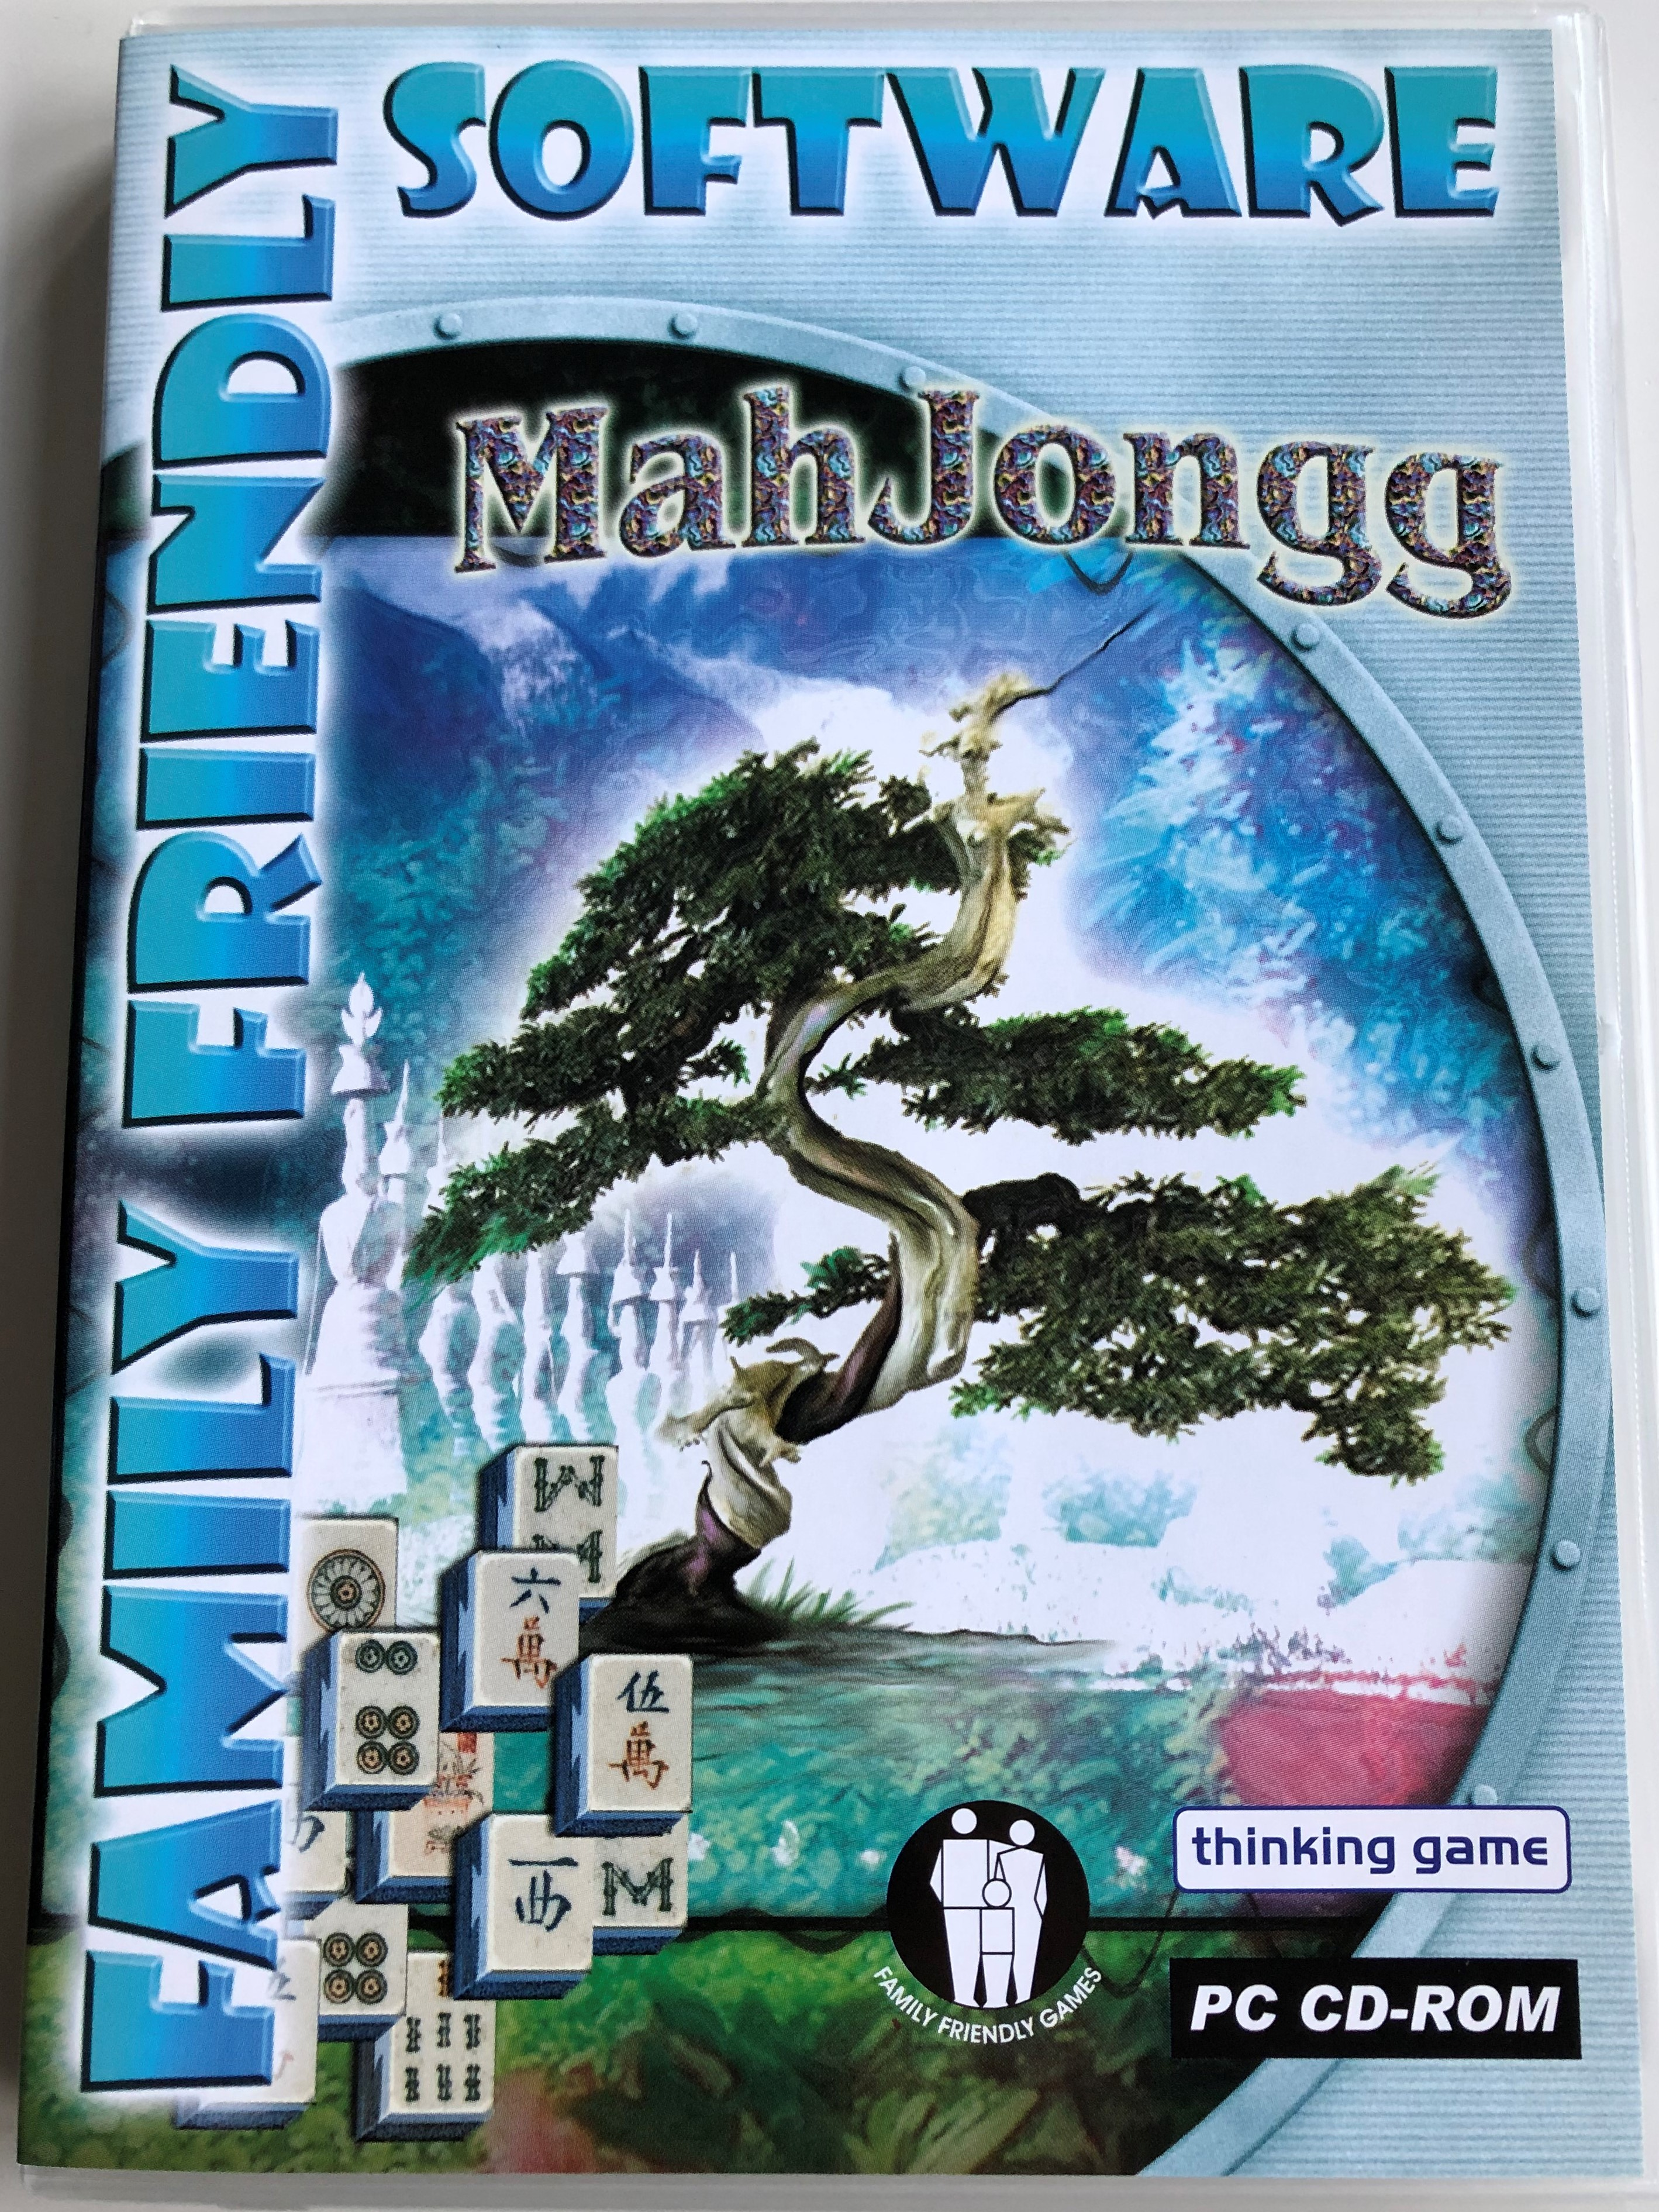 mahjongg-thinking-game-family-friendly-software-pc-cd-rom-1.jpg